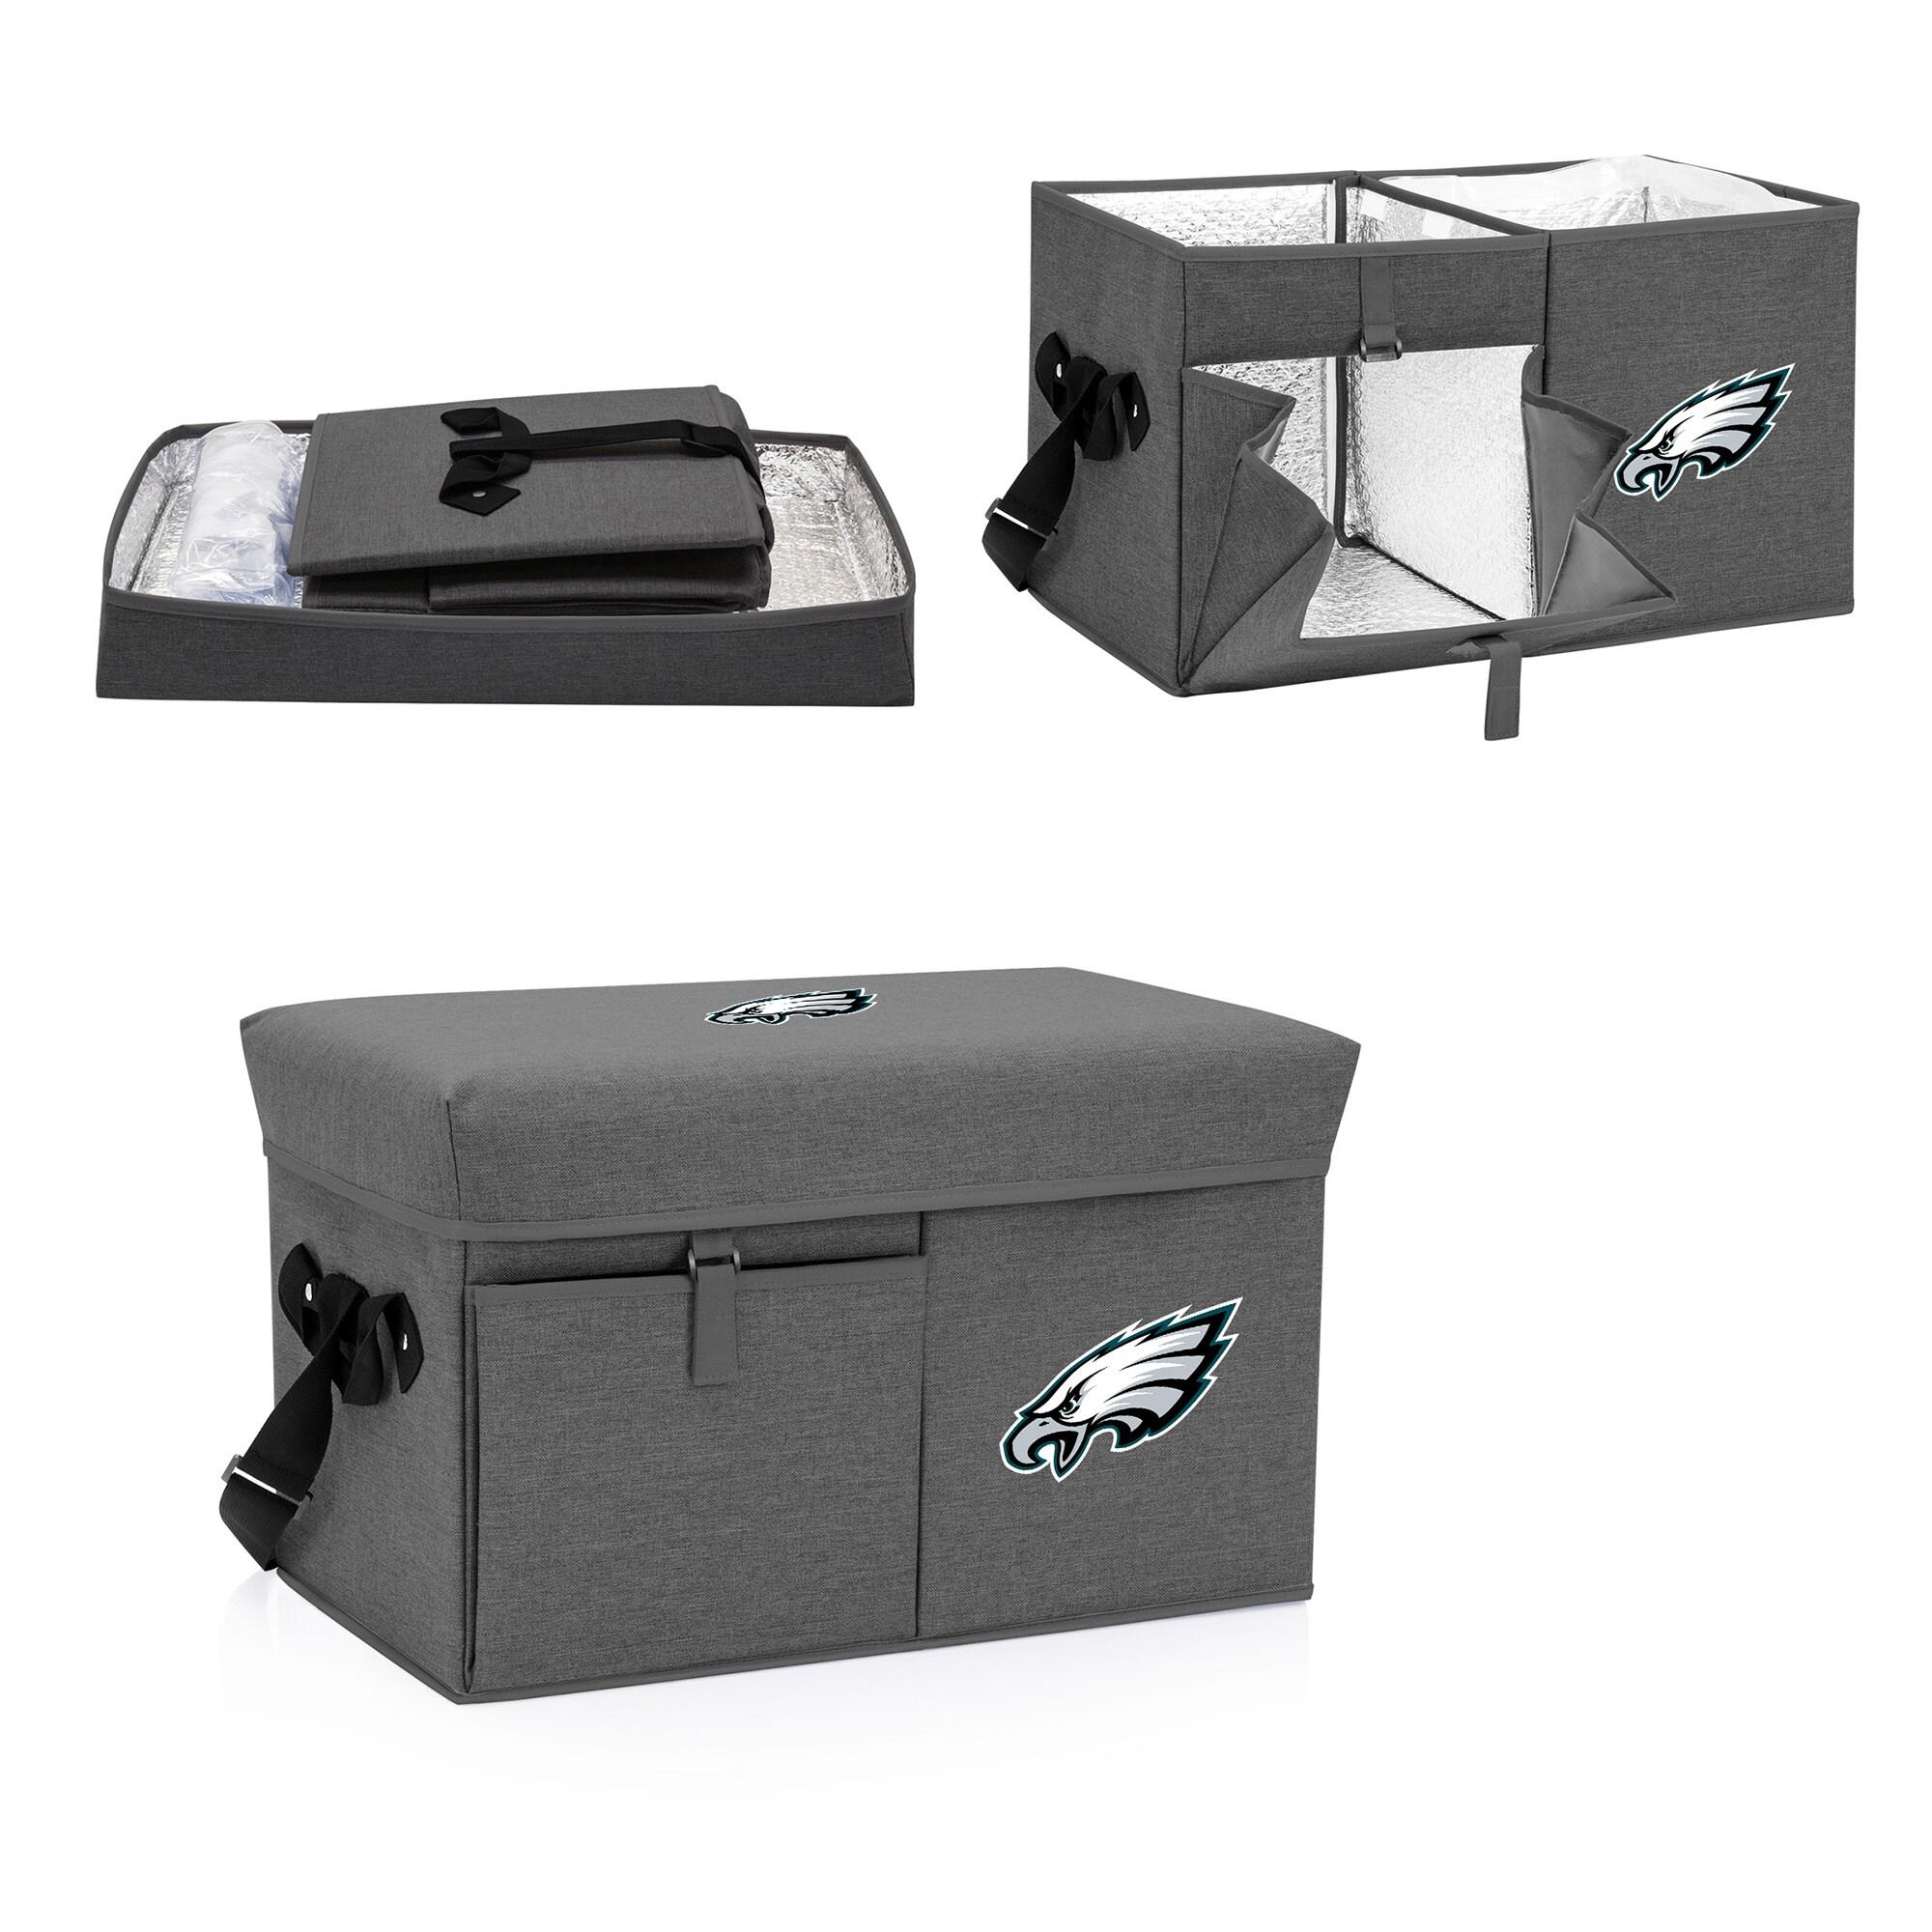 Philadelphia Eagles Ottoman Cooler & Seat - Gray